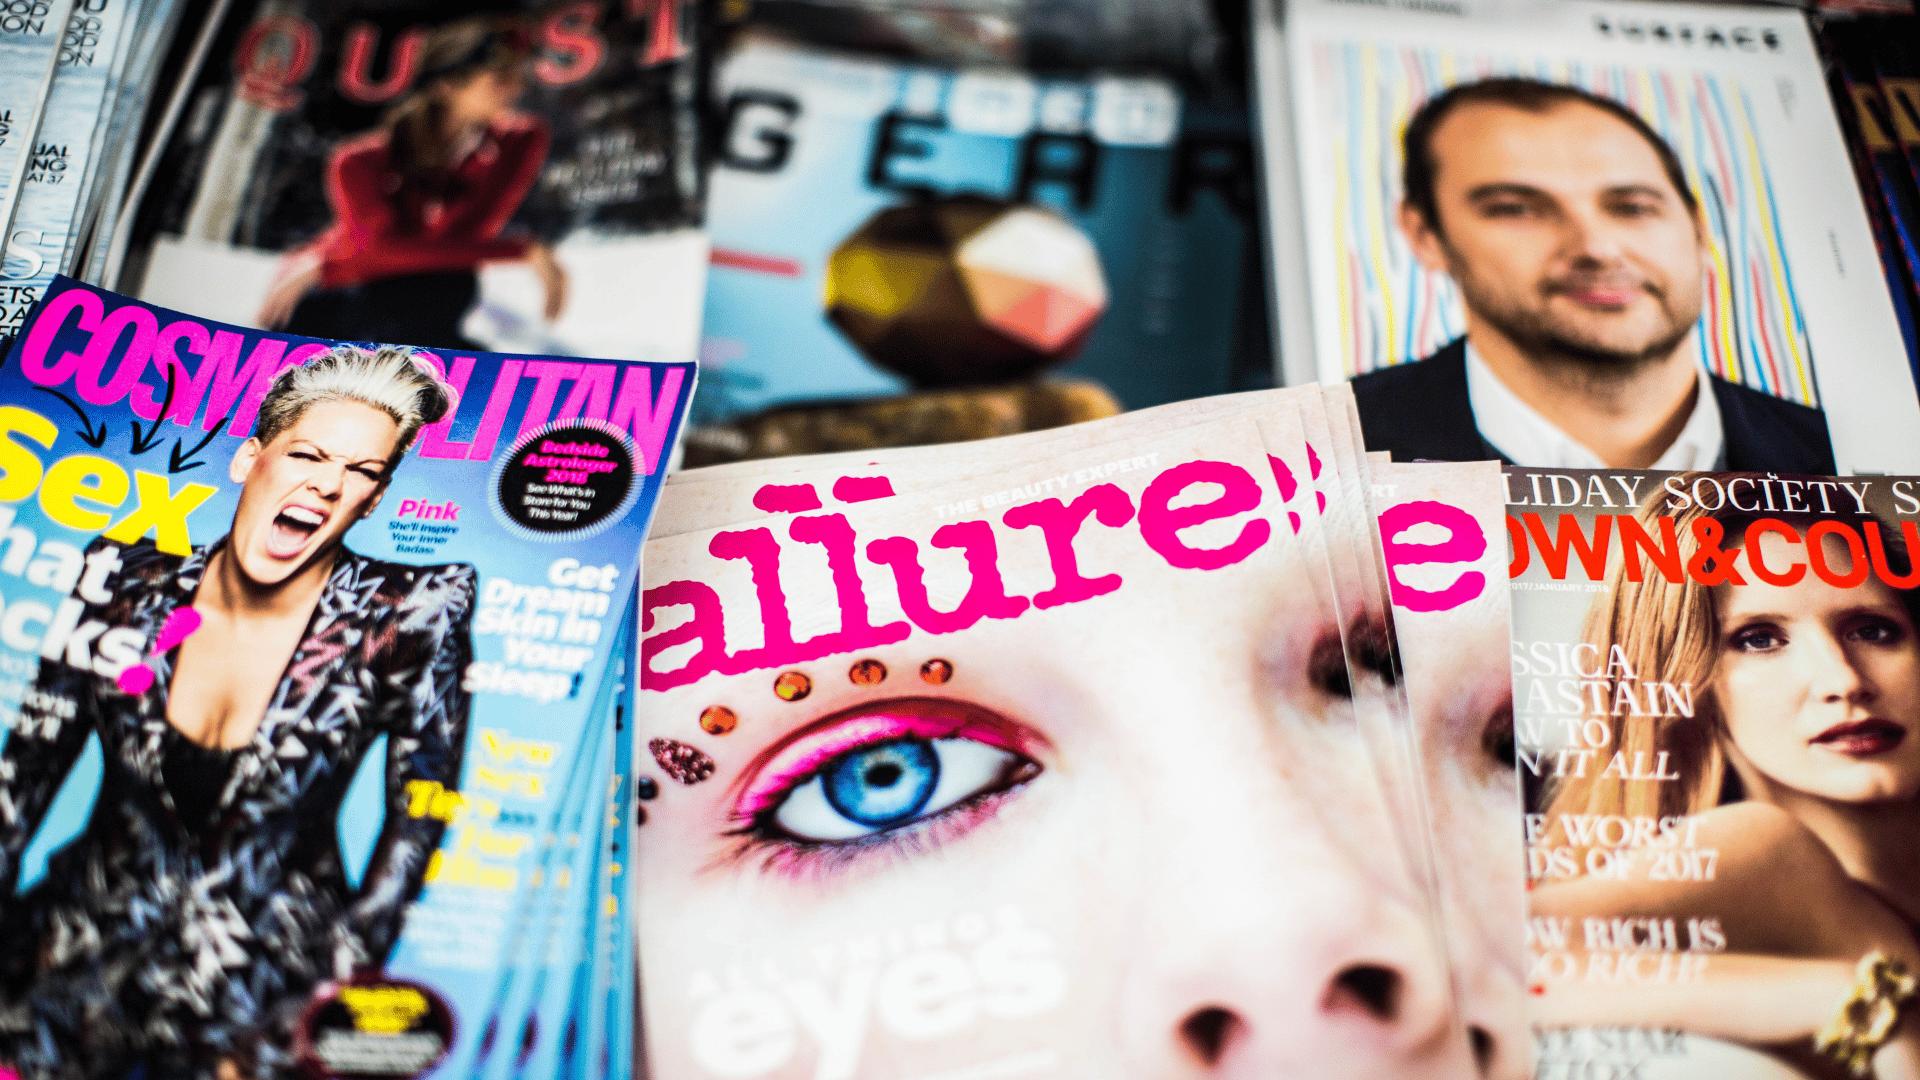 pile of women's magazines